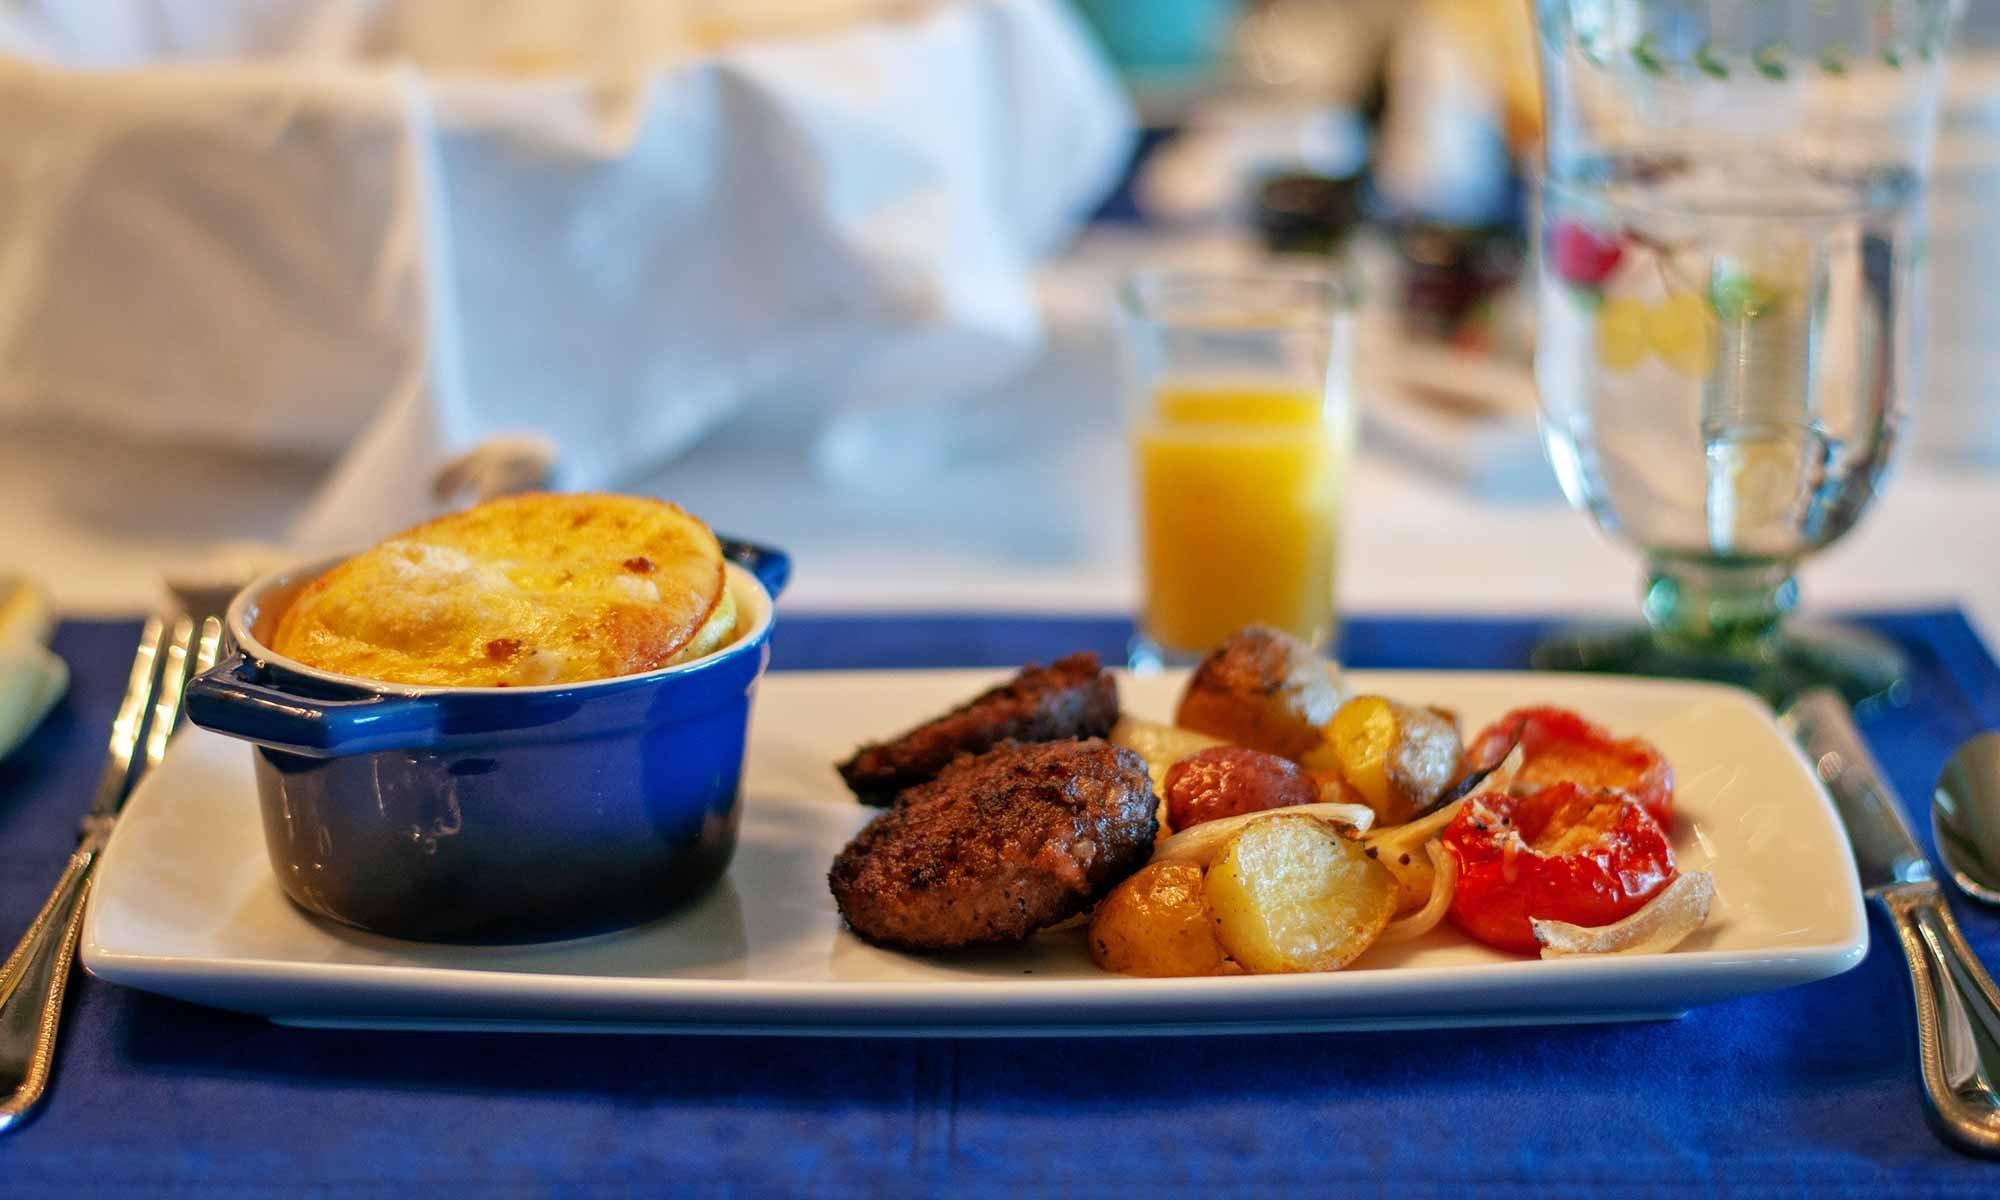 Breakfast Dish on Table